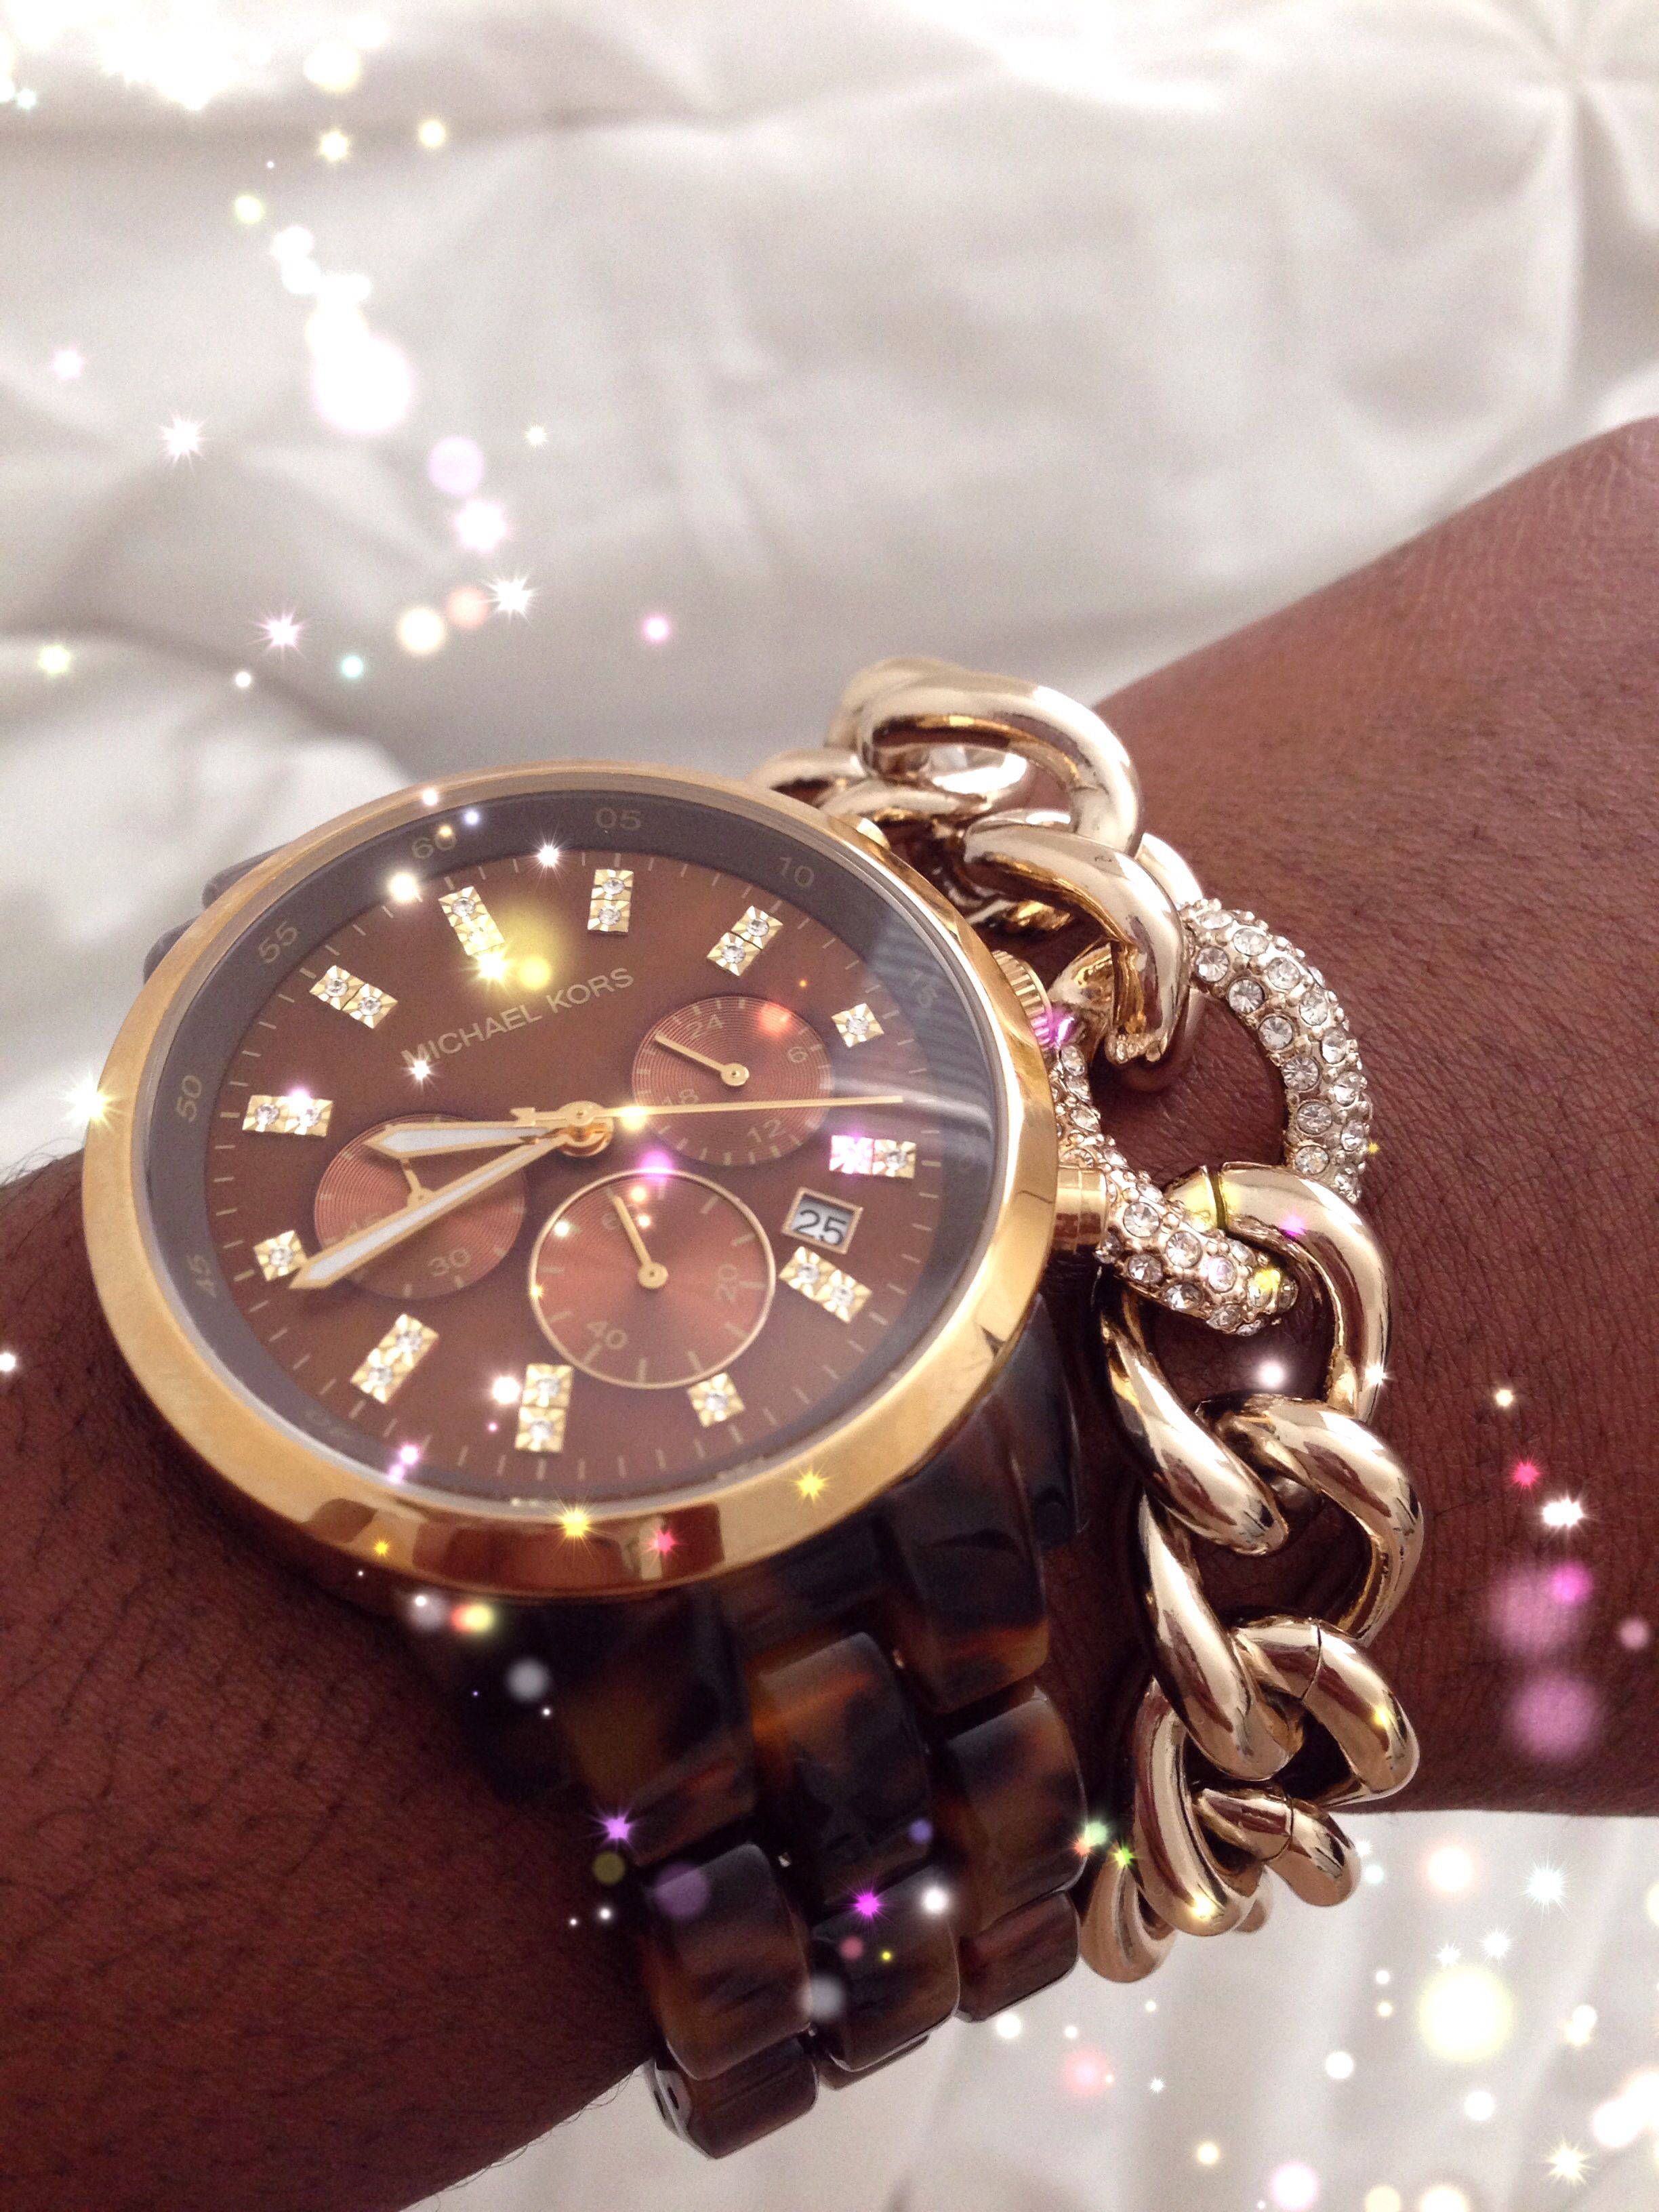 Michael kors watch u victoriaus secret bracelet jewelry is a girls